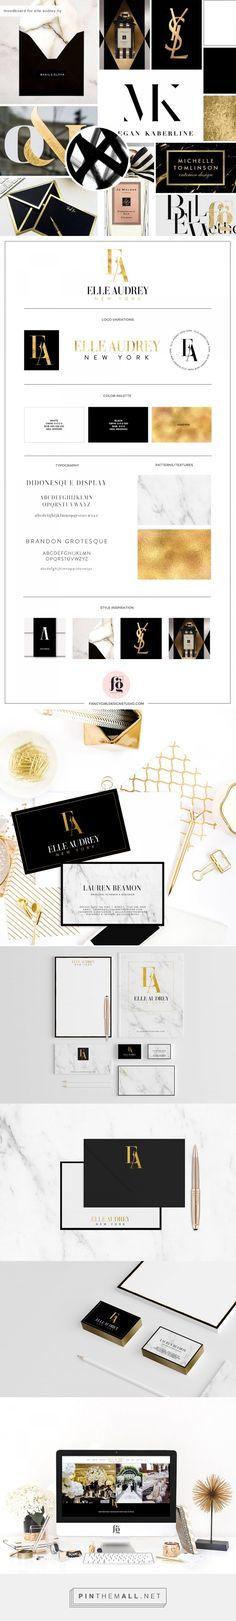 Brand Identity Design for Elle Audrey New York | Fancy Girl Designs - created via https://pinthemall.net